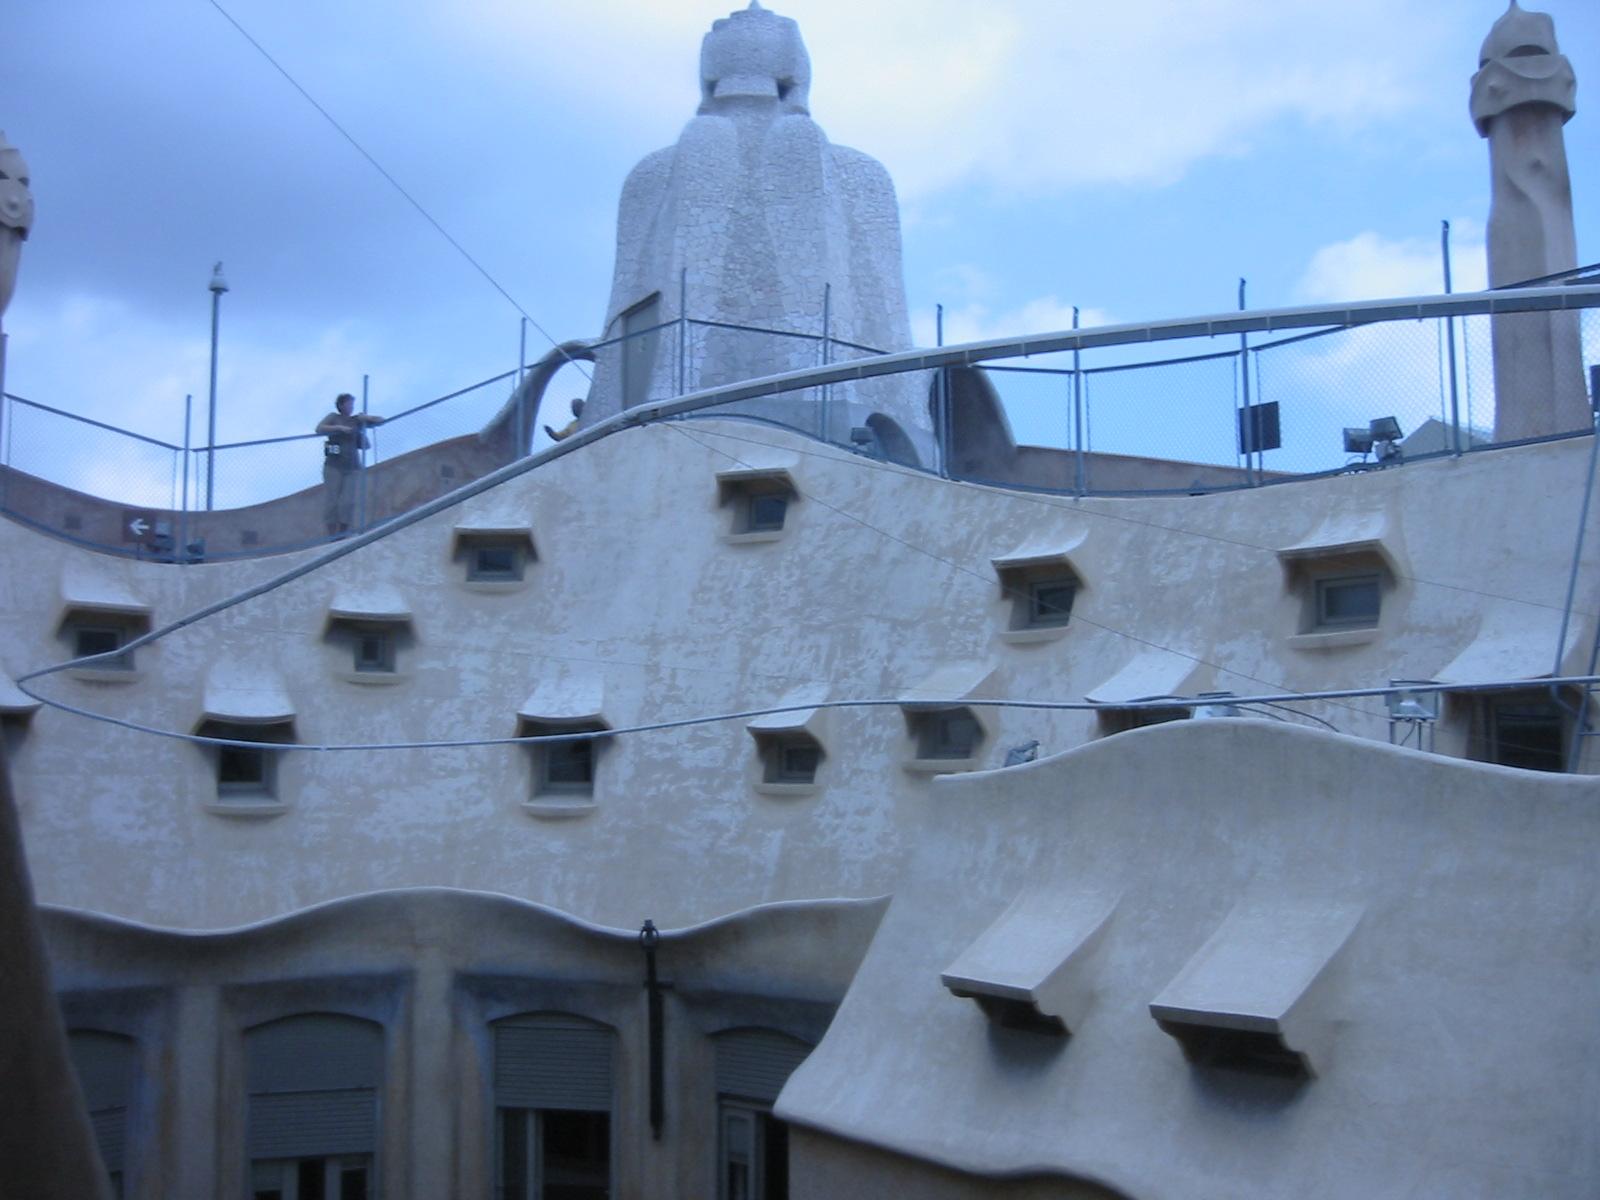 architecture exteriors barca barcelona gaudi building organic